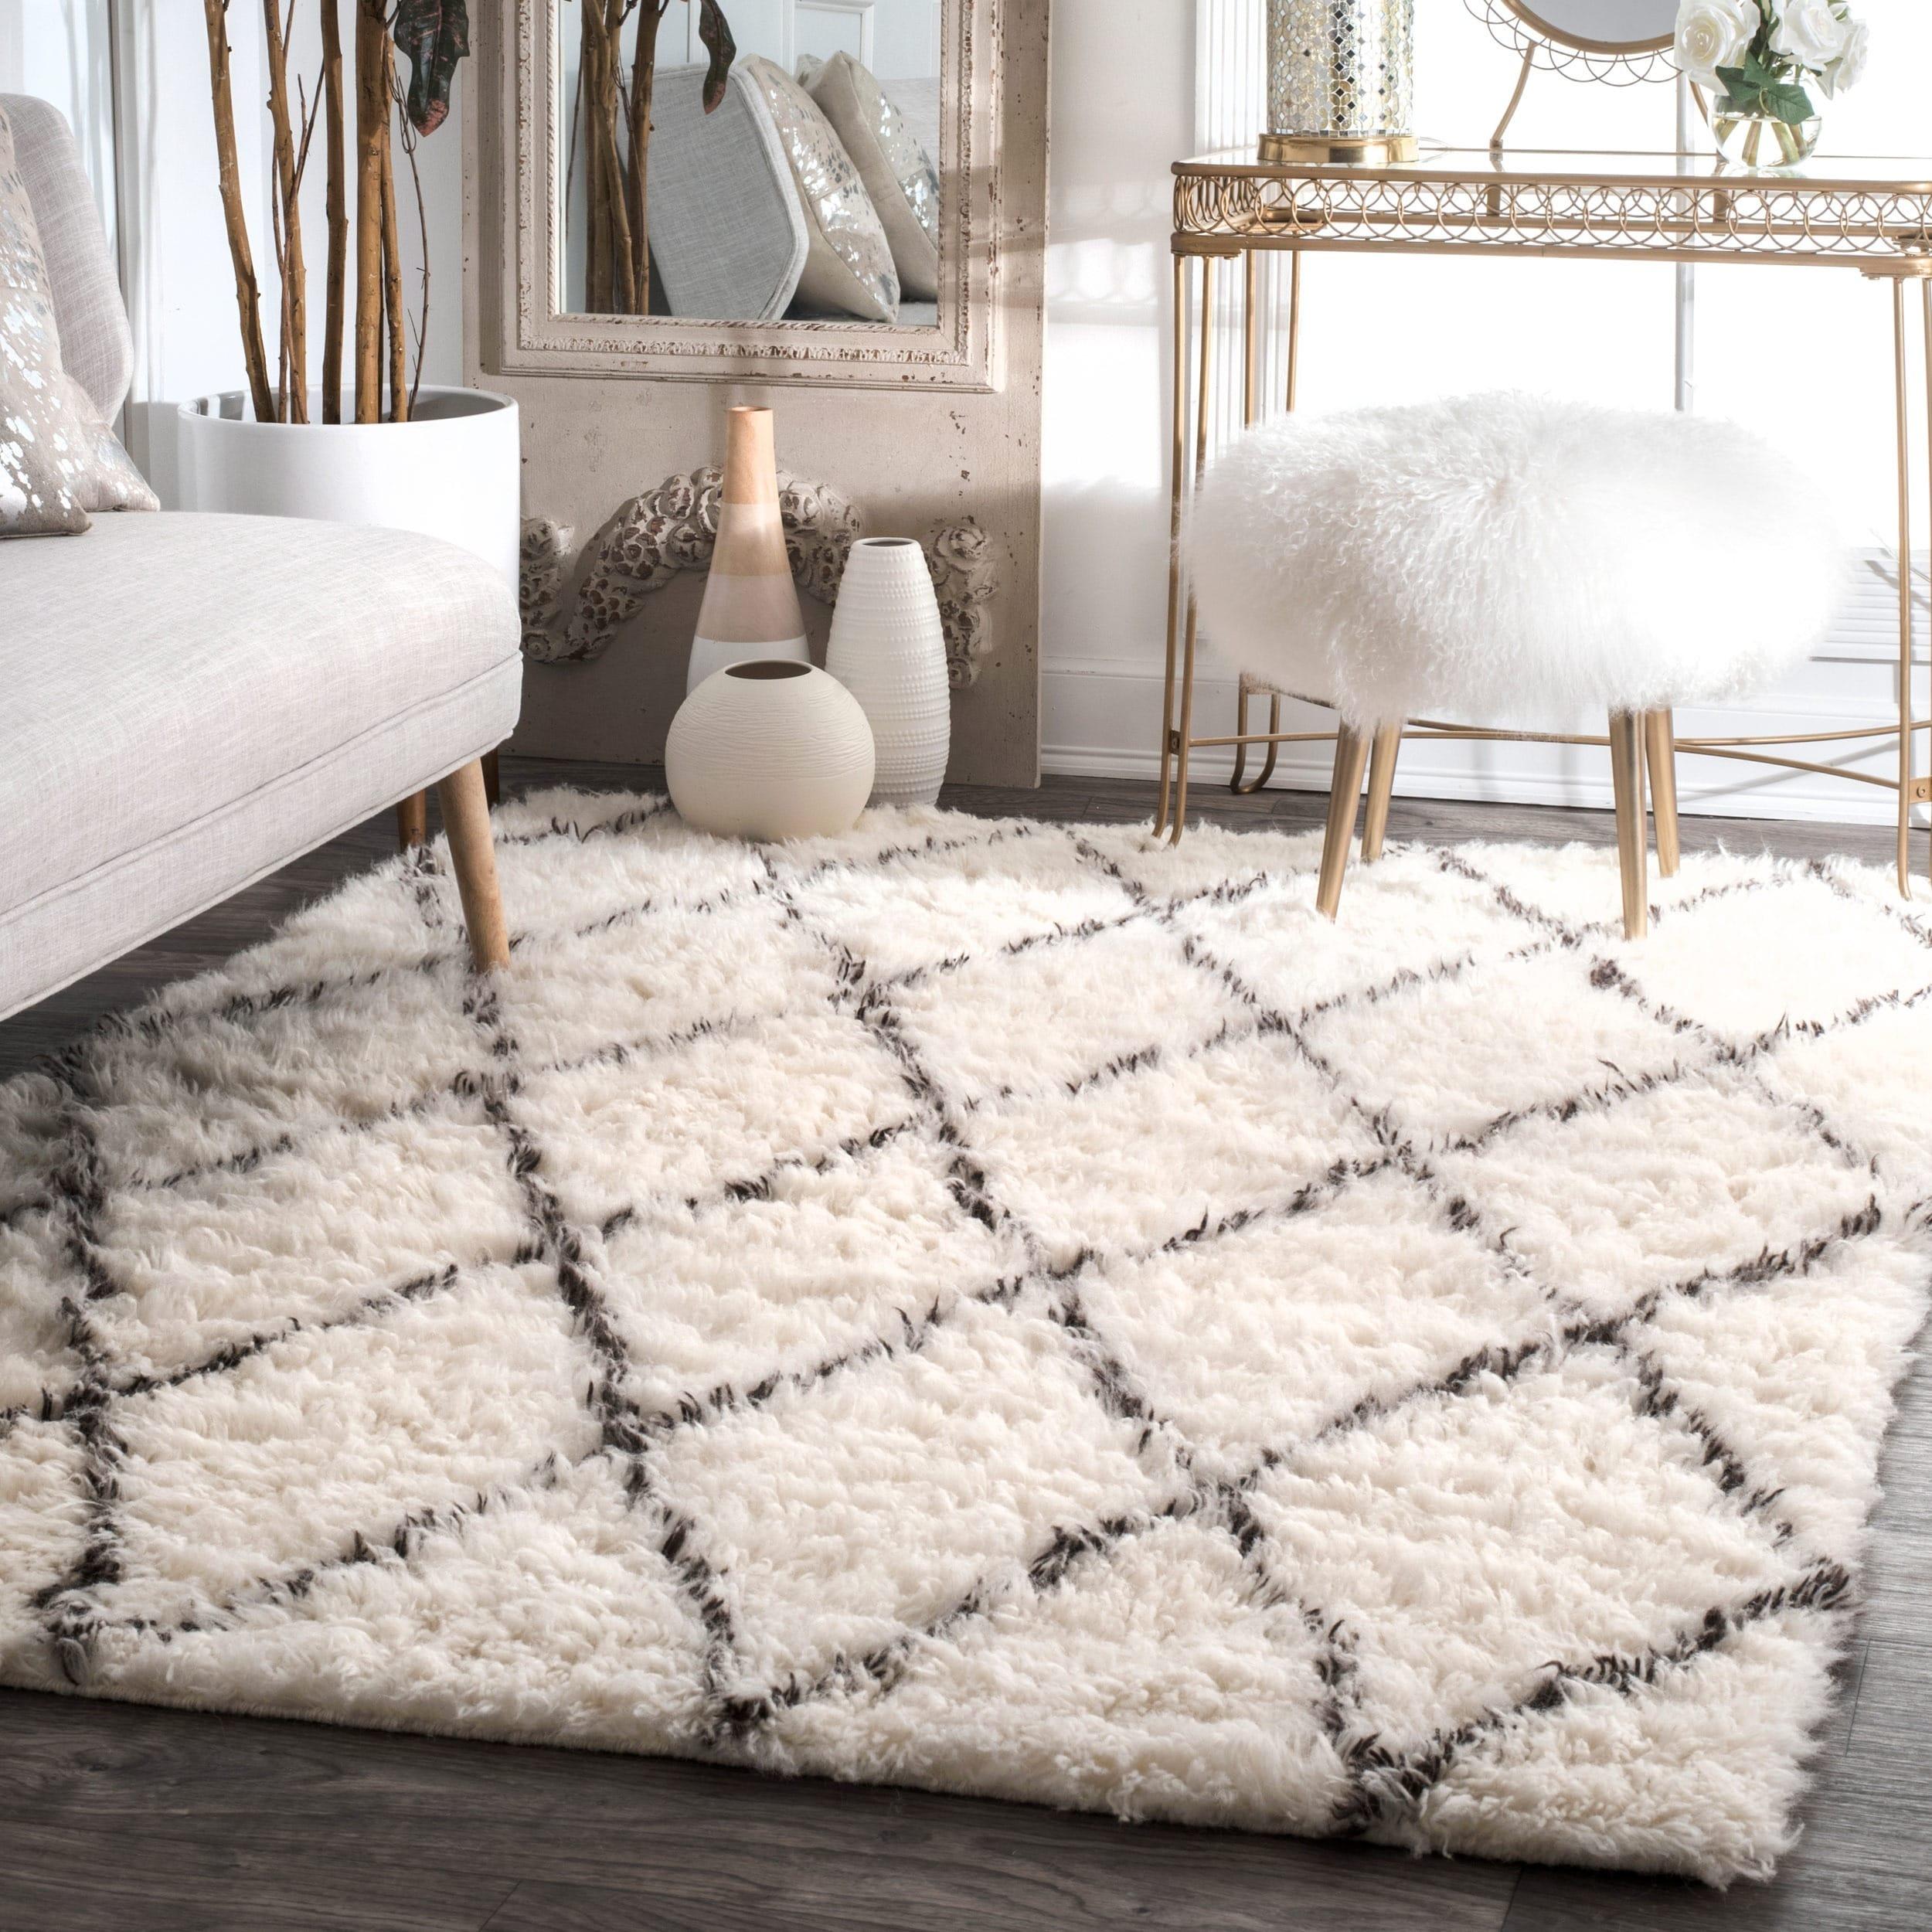 Nuloom Handmade Moroccan Trellis Wool Shag Area Rug 8 X 10 On Free Shipping Today Com 7508982